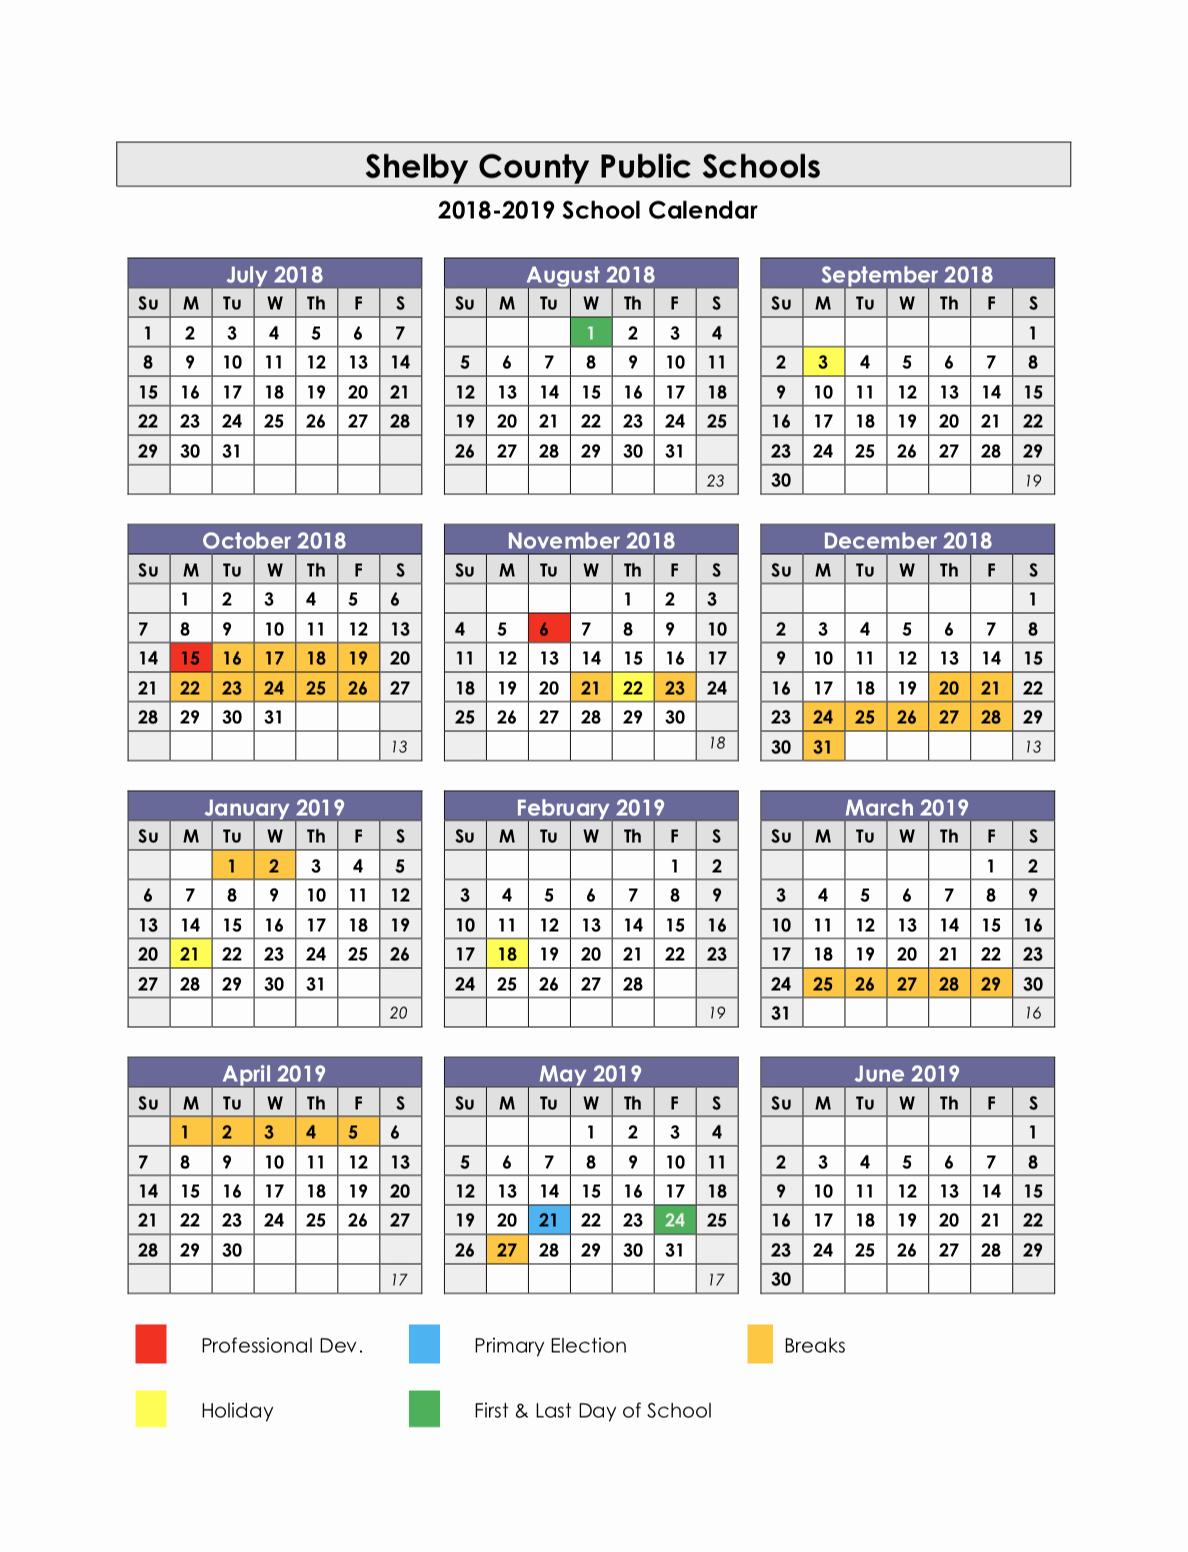 School Calendar 2018 19 Template Awesome Collins High School Calendar